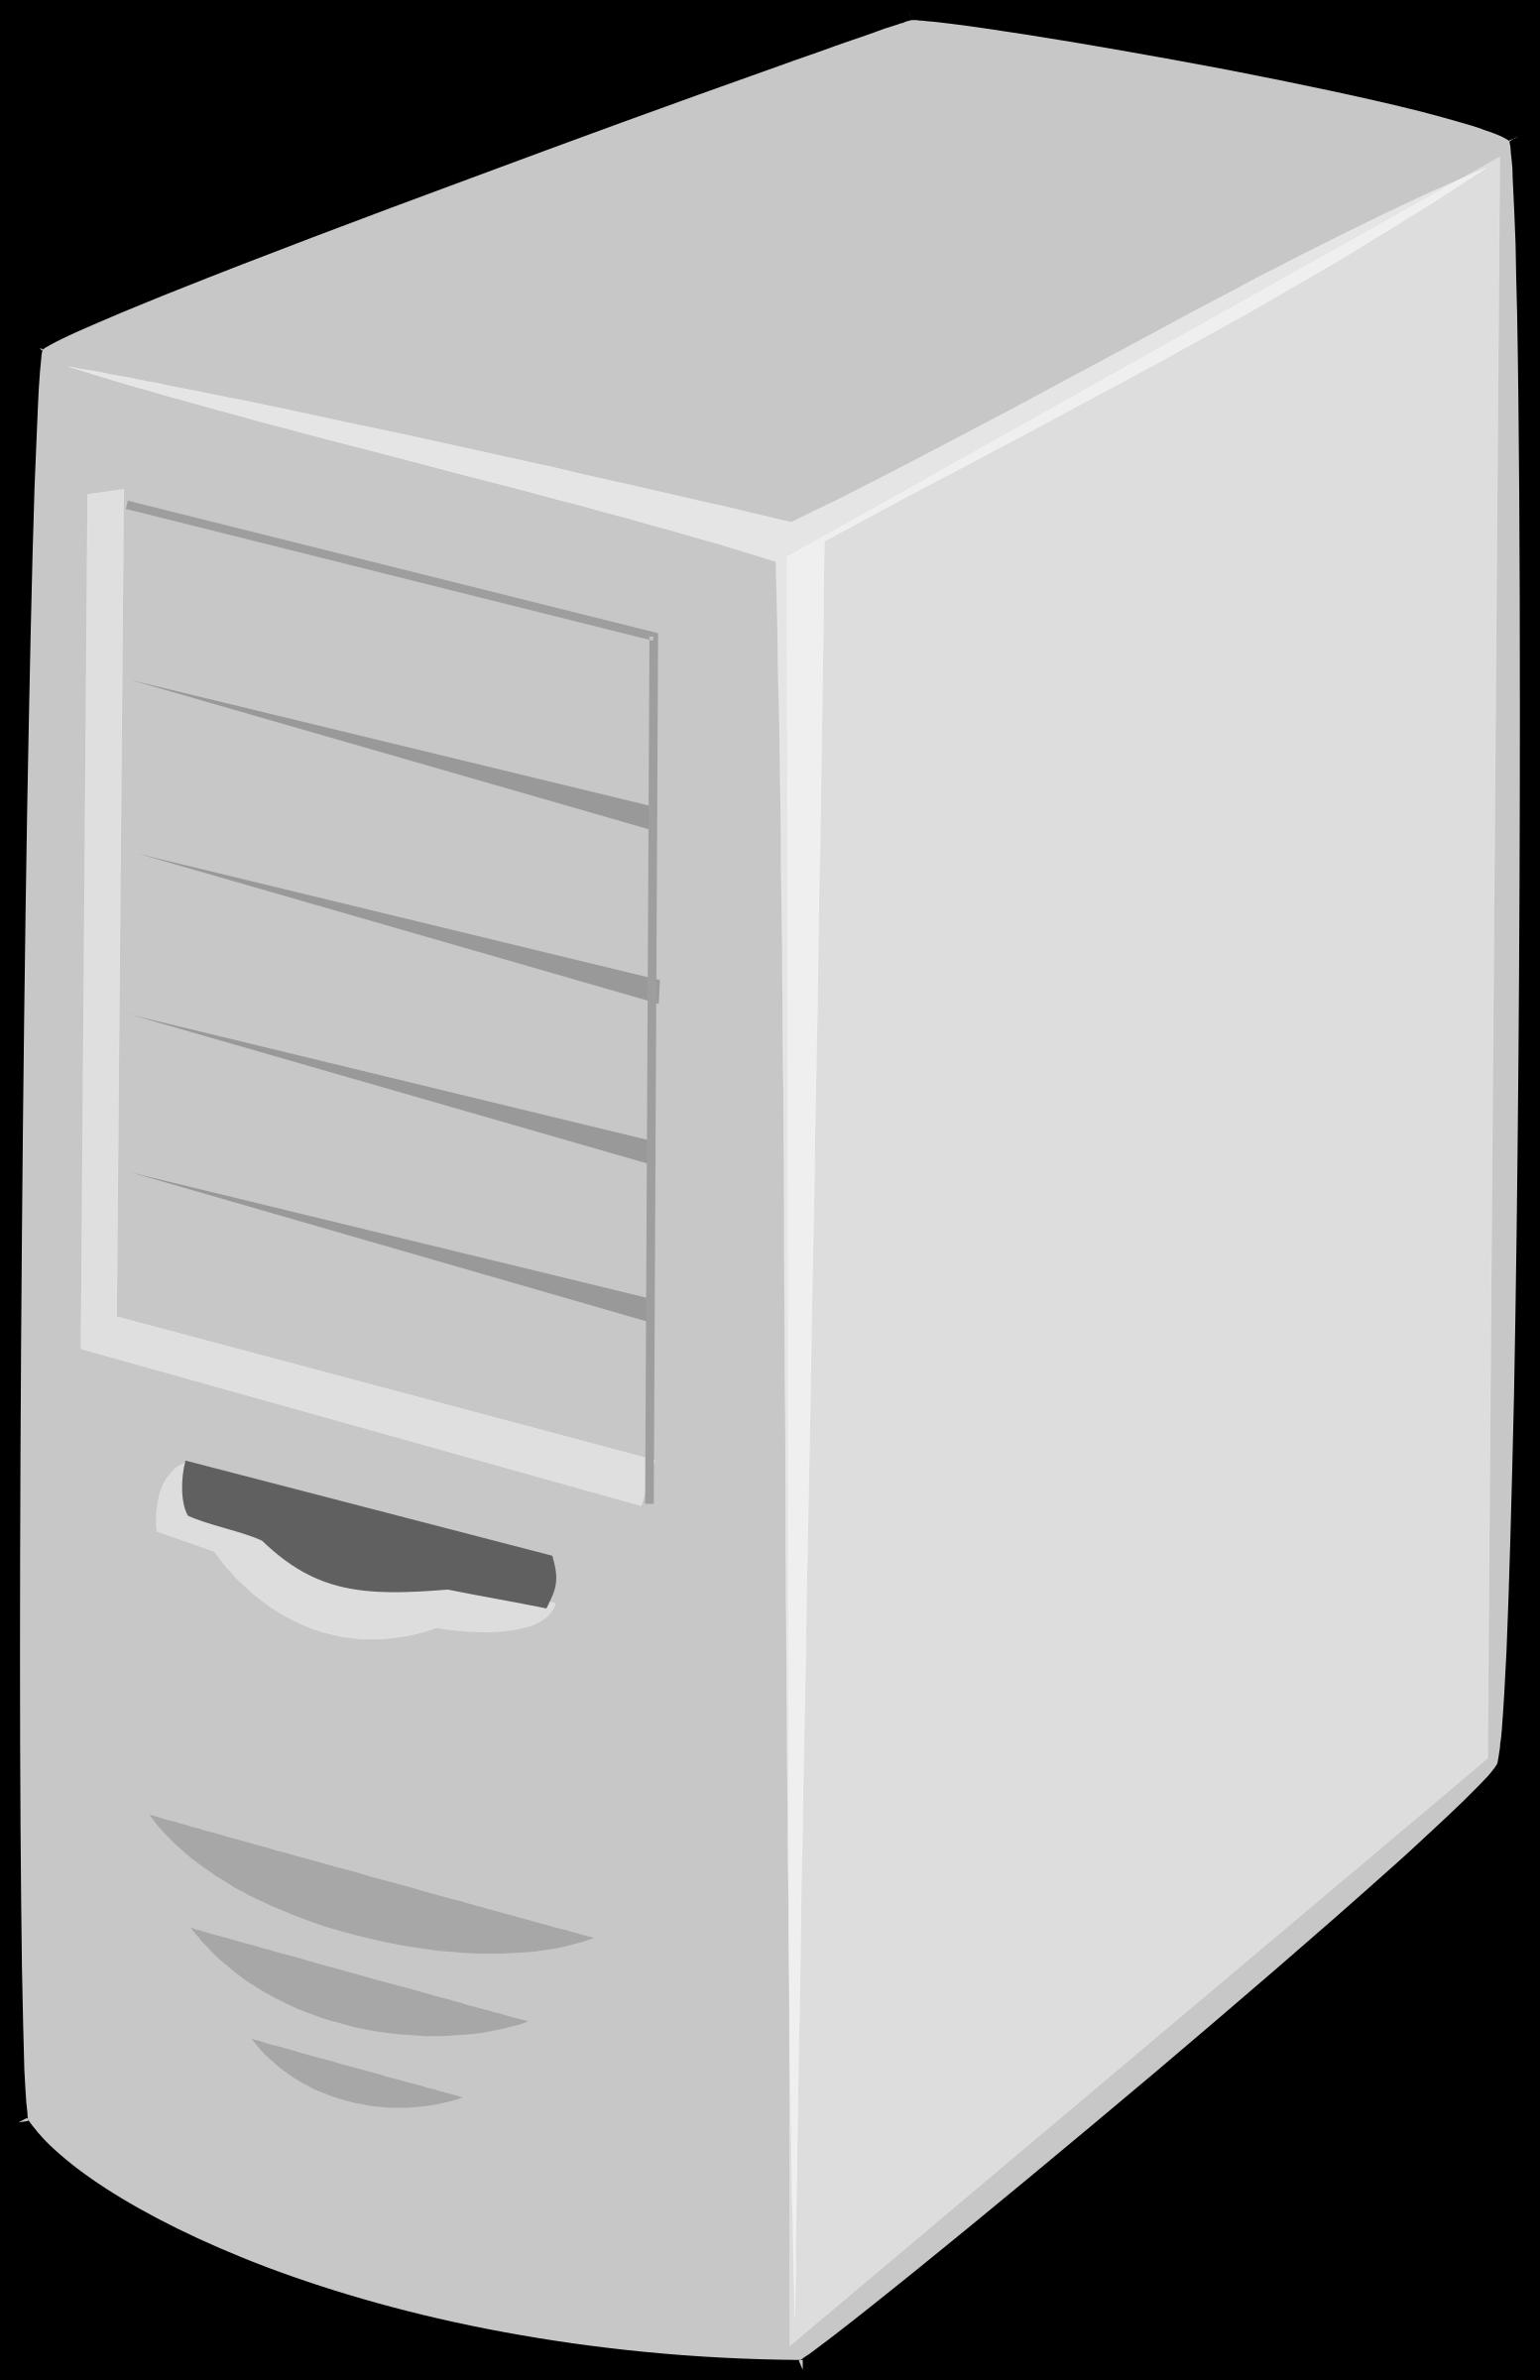 Dedicated Server PNG Image.